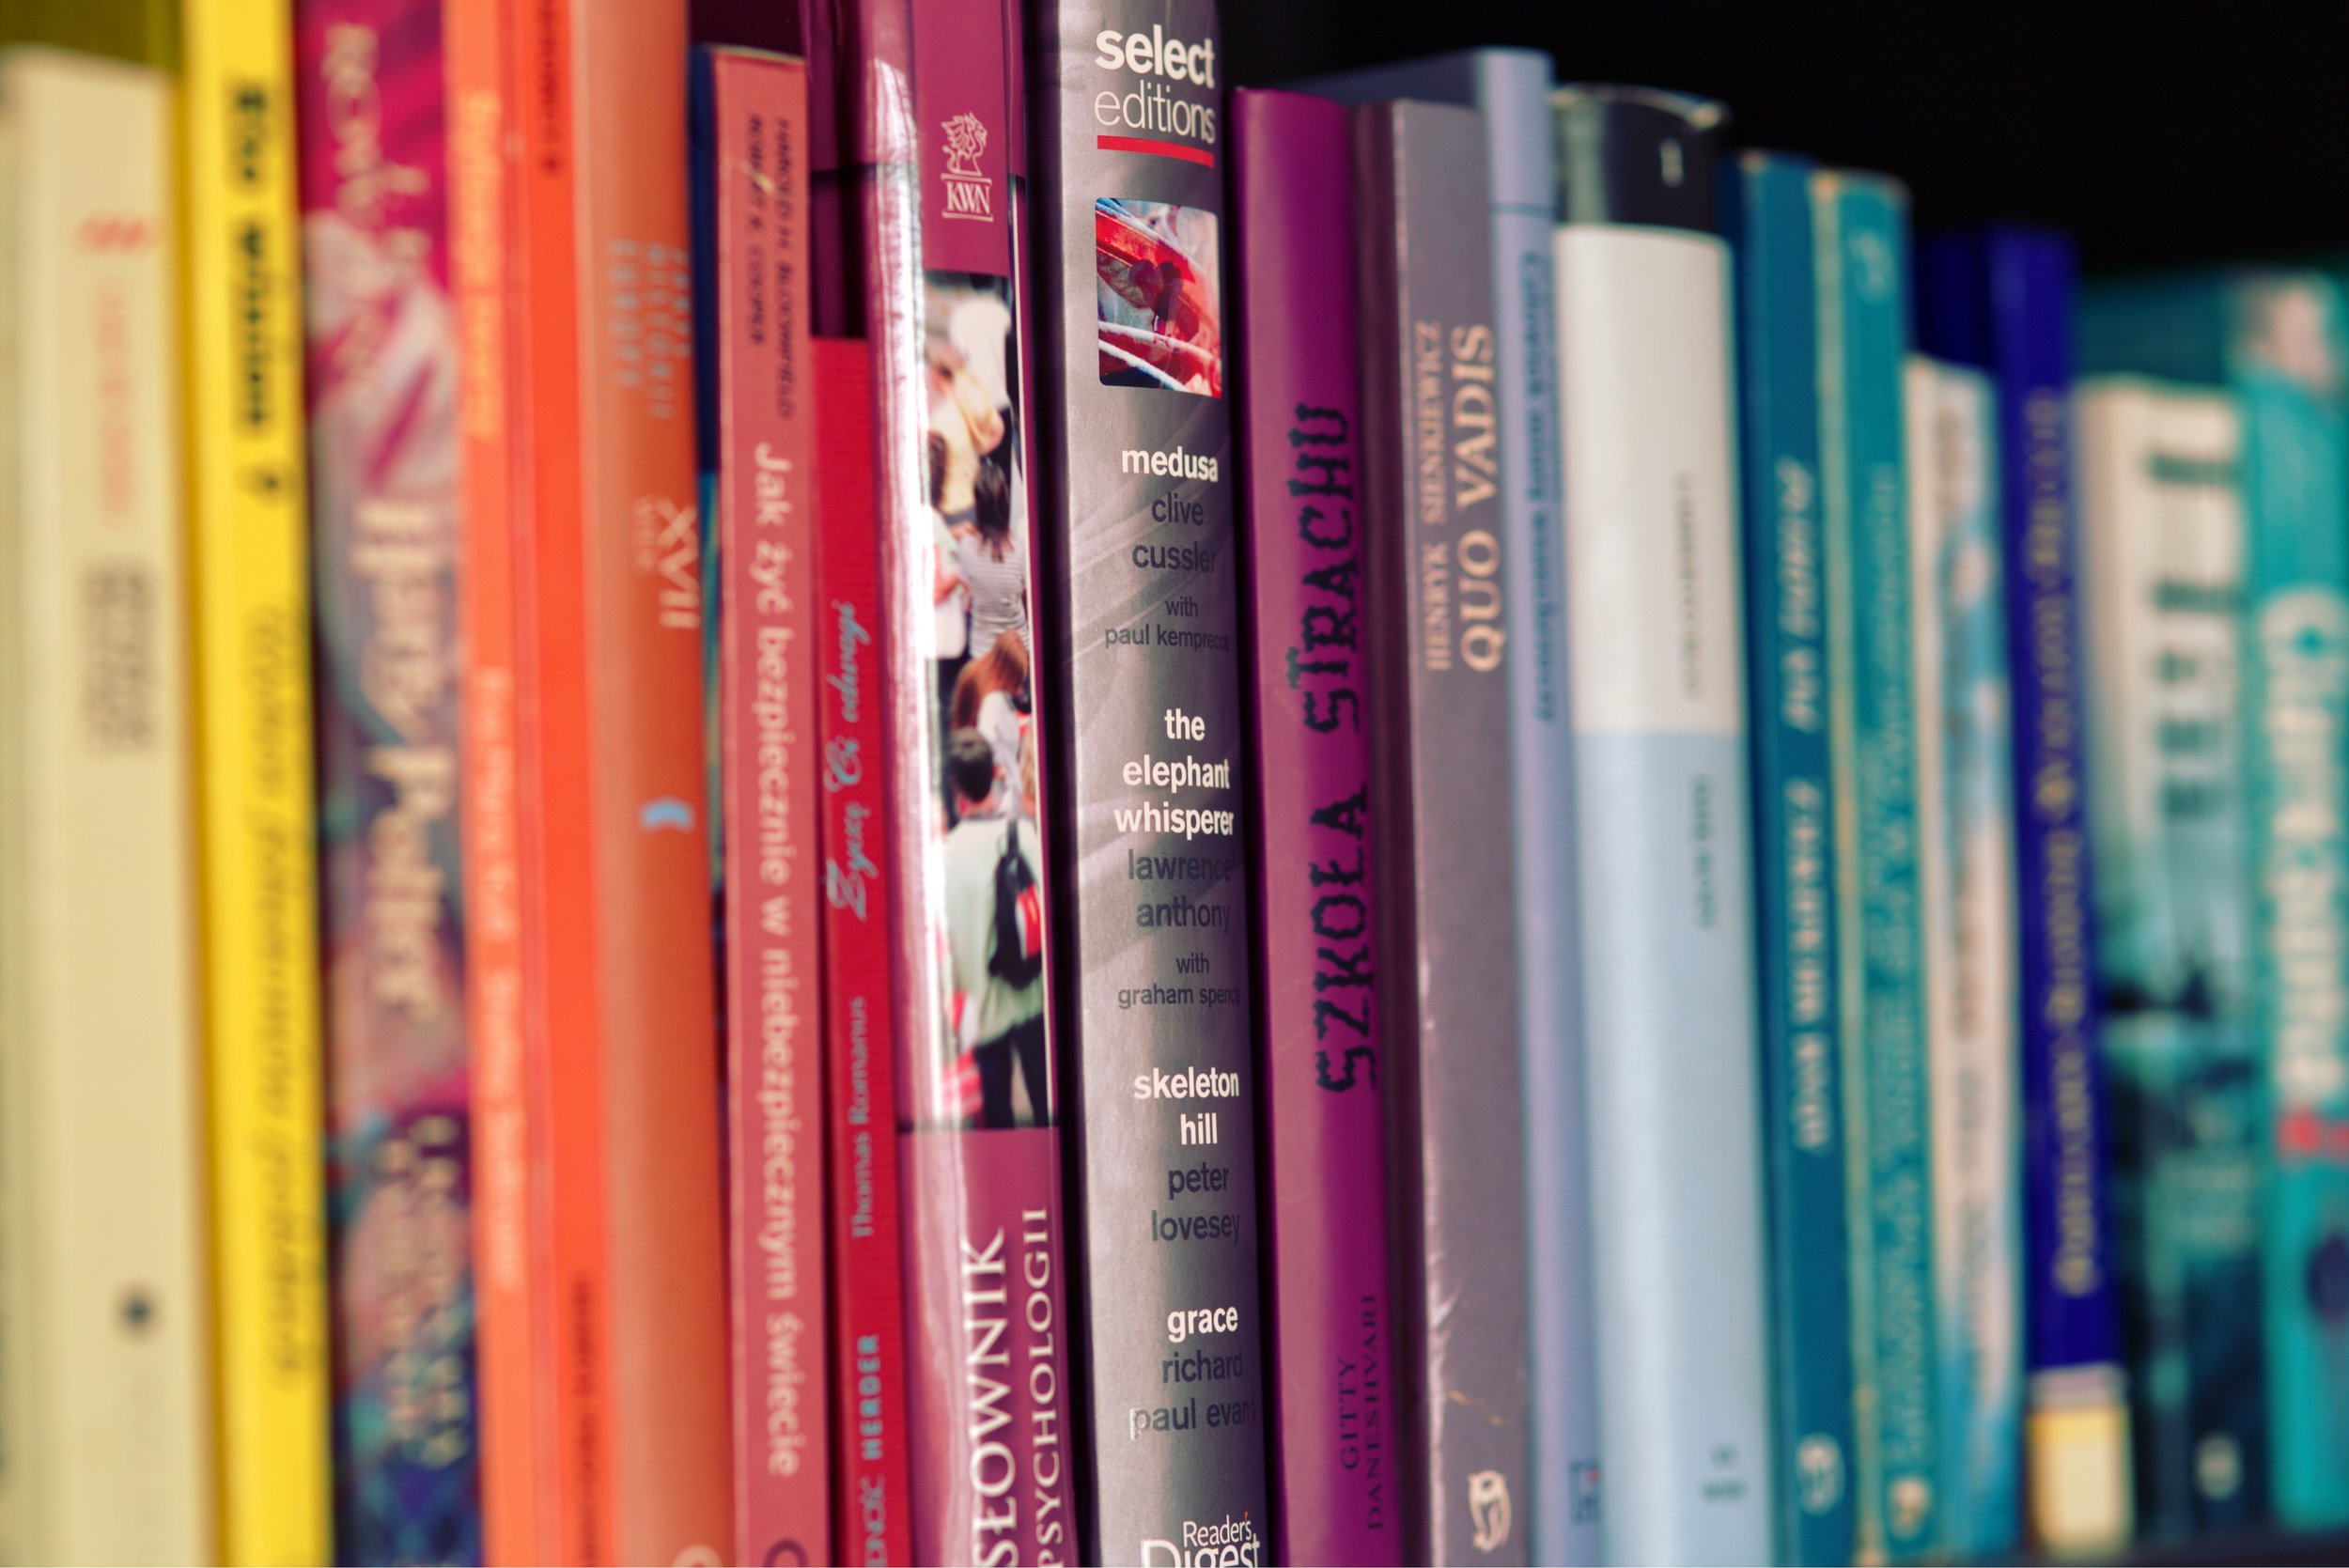 book-shelves-books-colorful-5711 (1).jpg